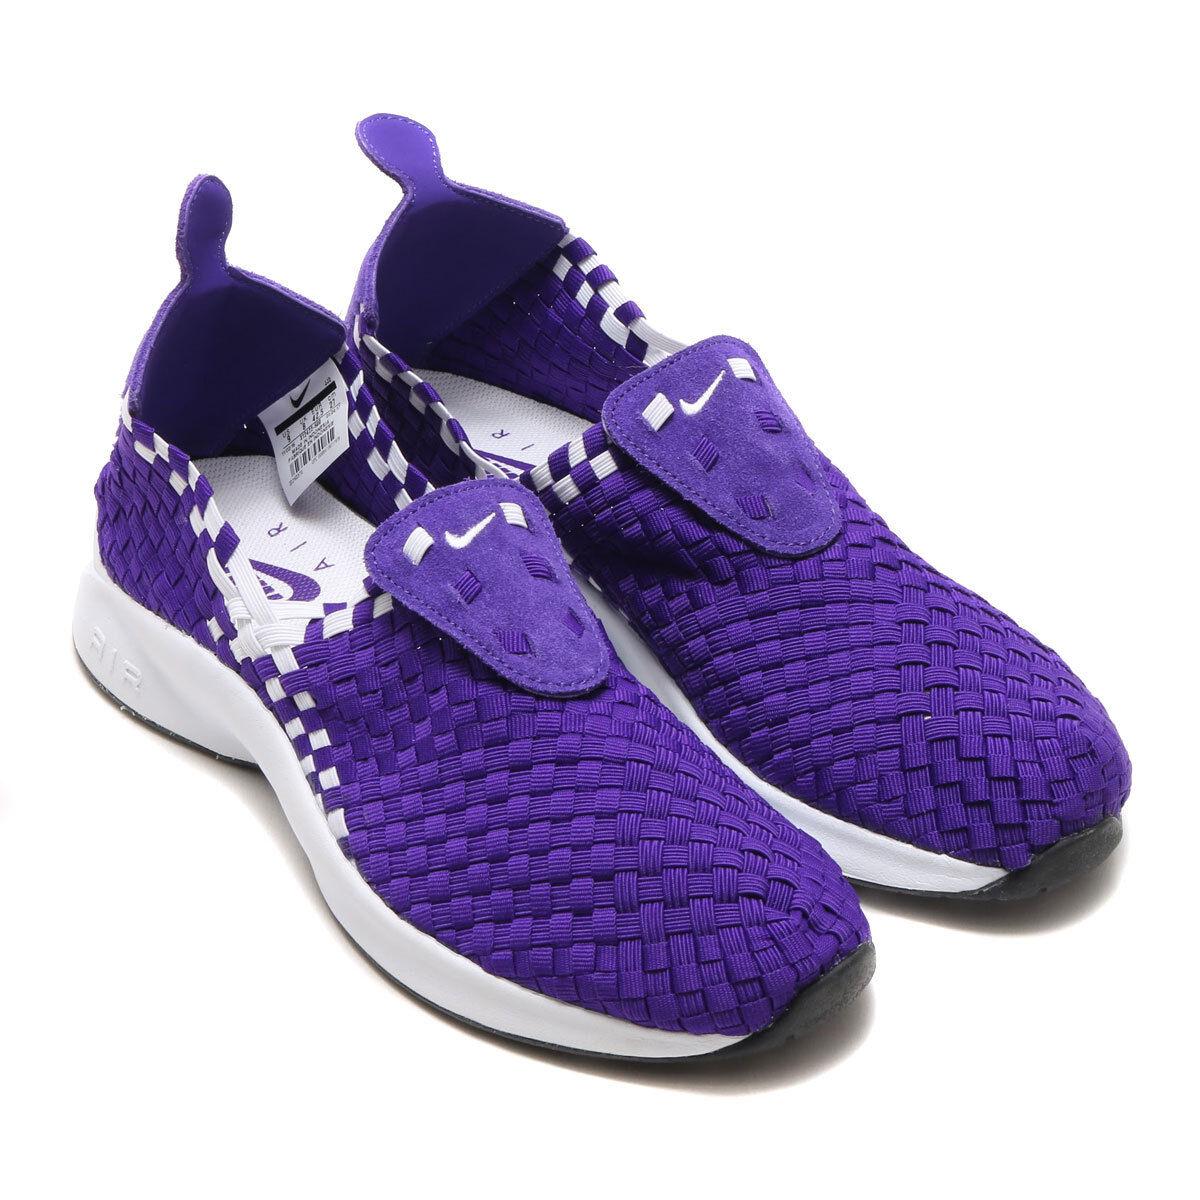 NEW Purple Nike Air Woven Court Purple NEW White Black Footscape Mens SAMPLE Low QS sz 10 9e8d50